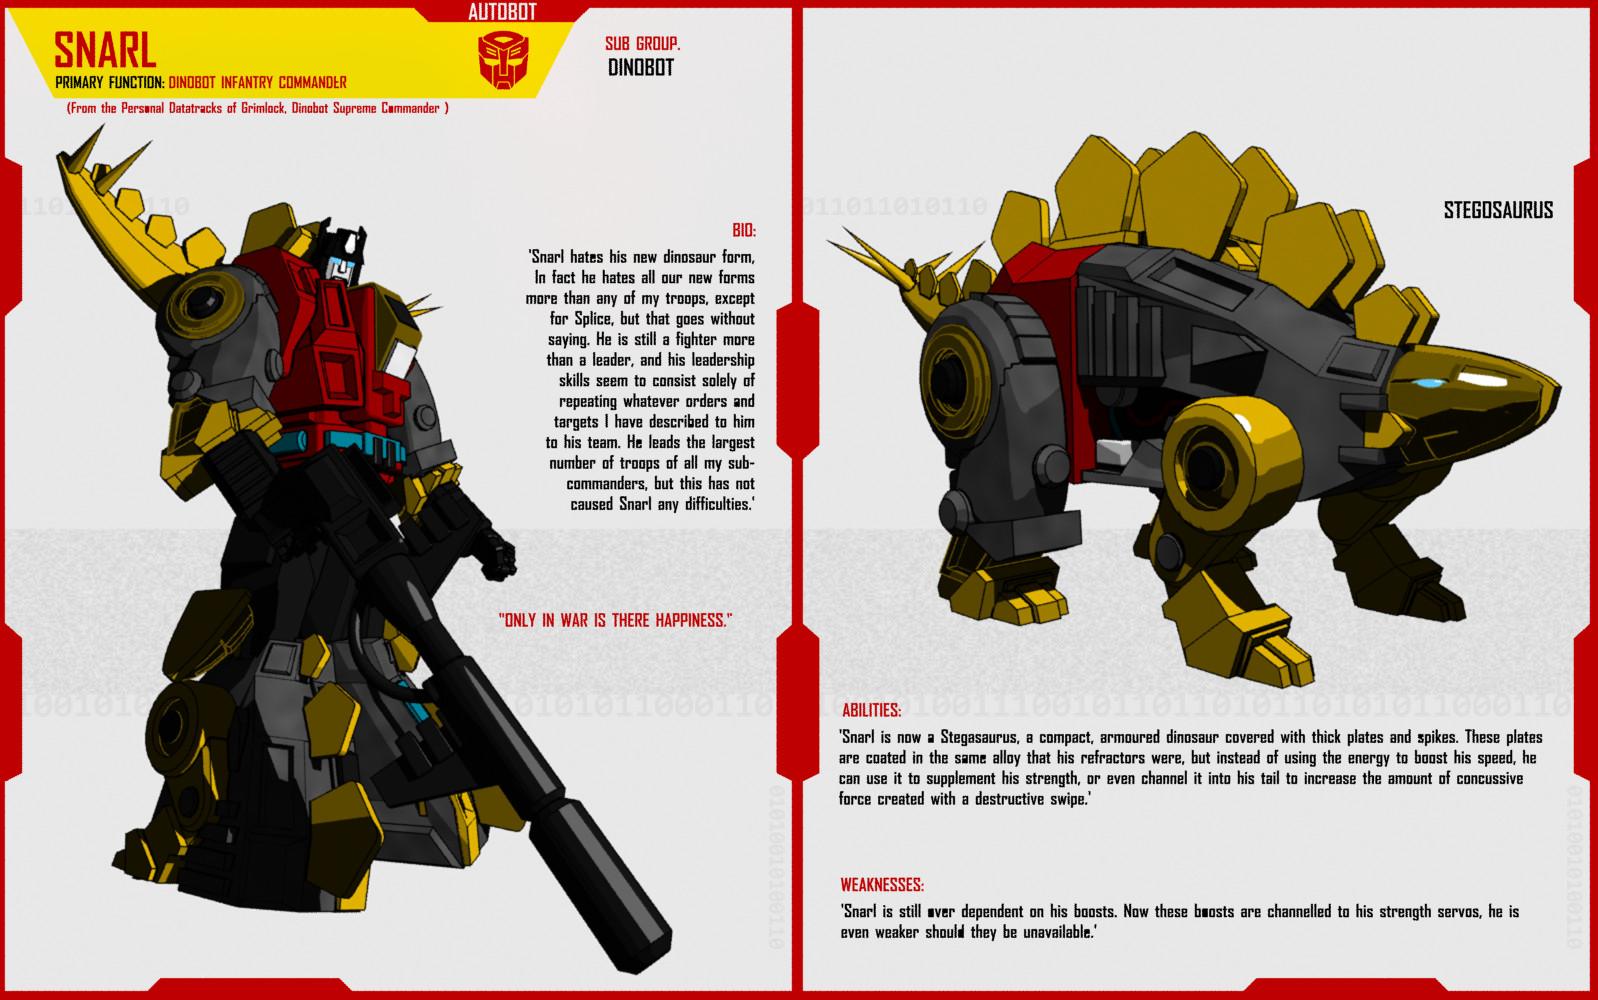 Transformers 4 dinobot snarl